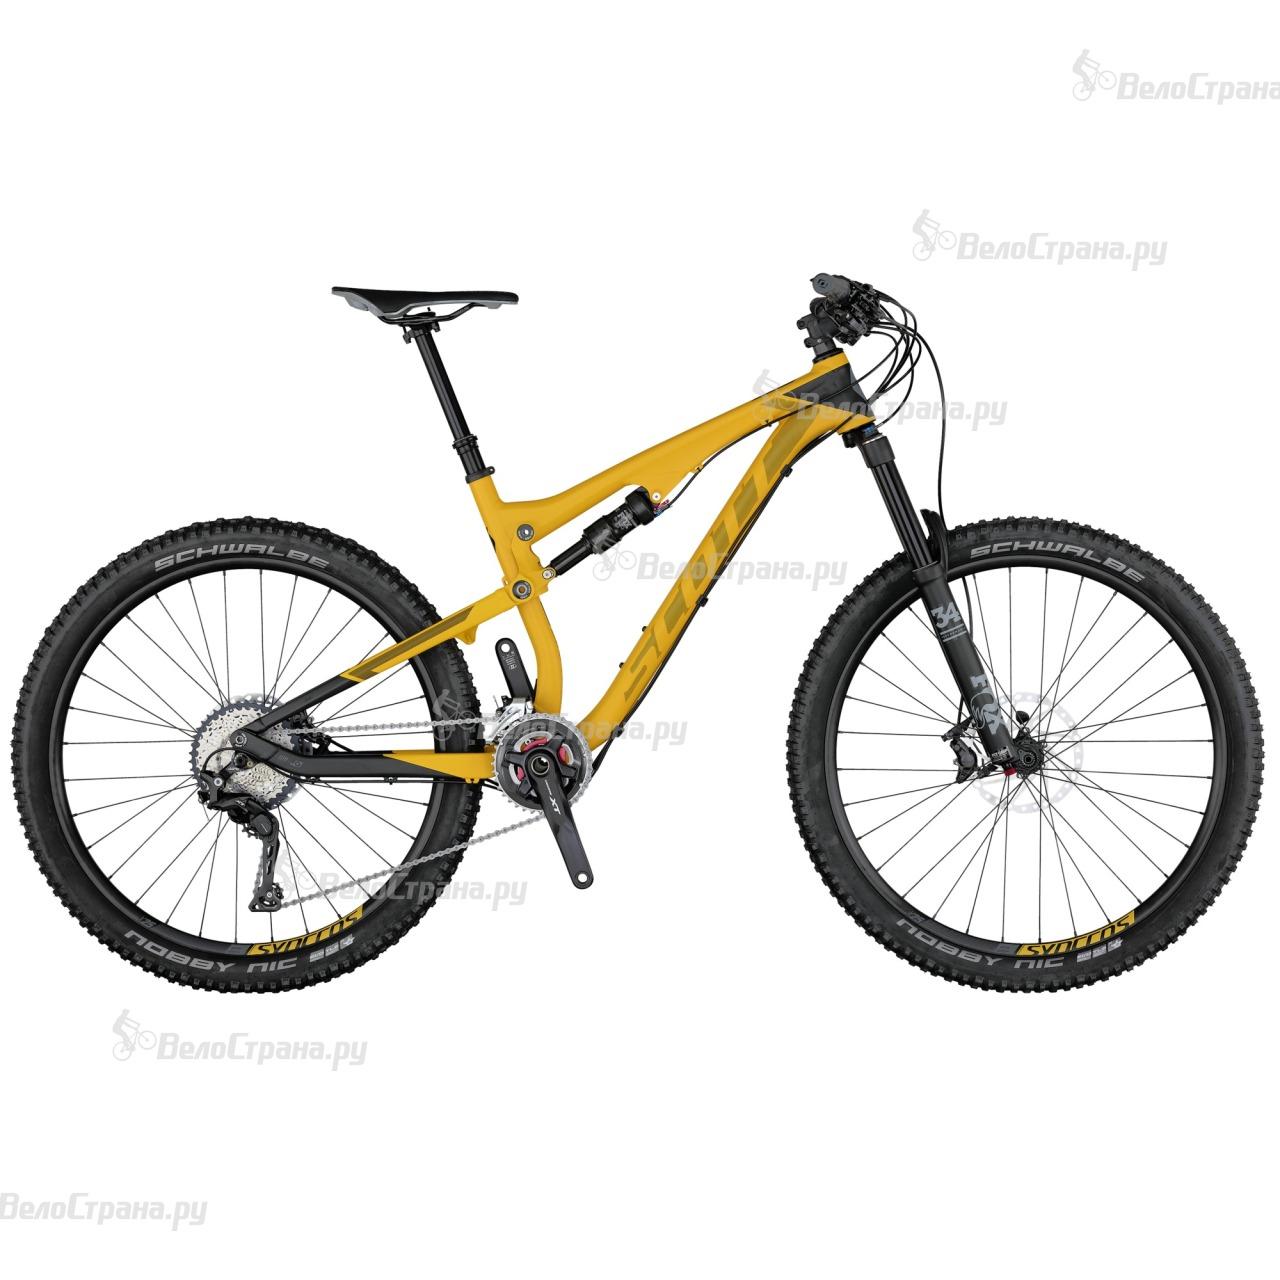 Велосипед Scott Genius 730 (2017) бмв 730 в украине